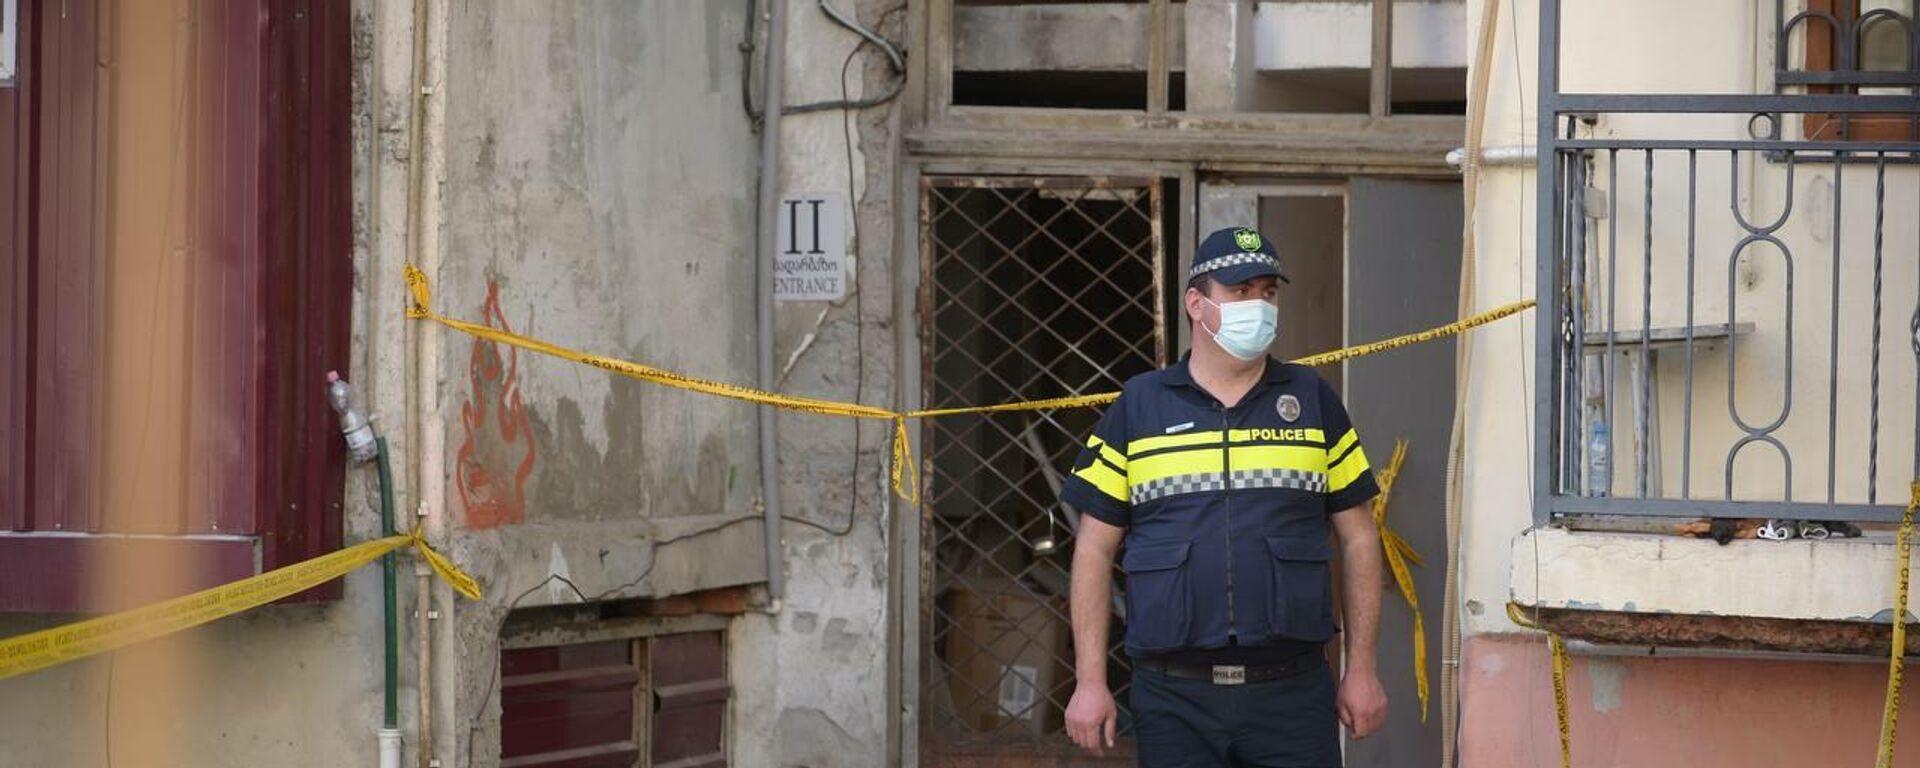 Фото с места обрушения подъезда жилого дома в Батуми. Полиция на месте ЧП - Sputnik Грузия, 1920, 10.10.2021